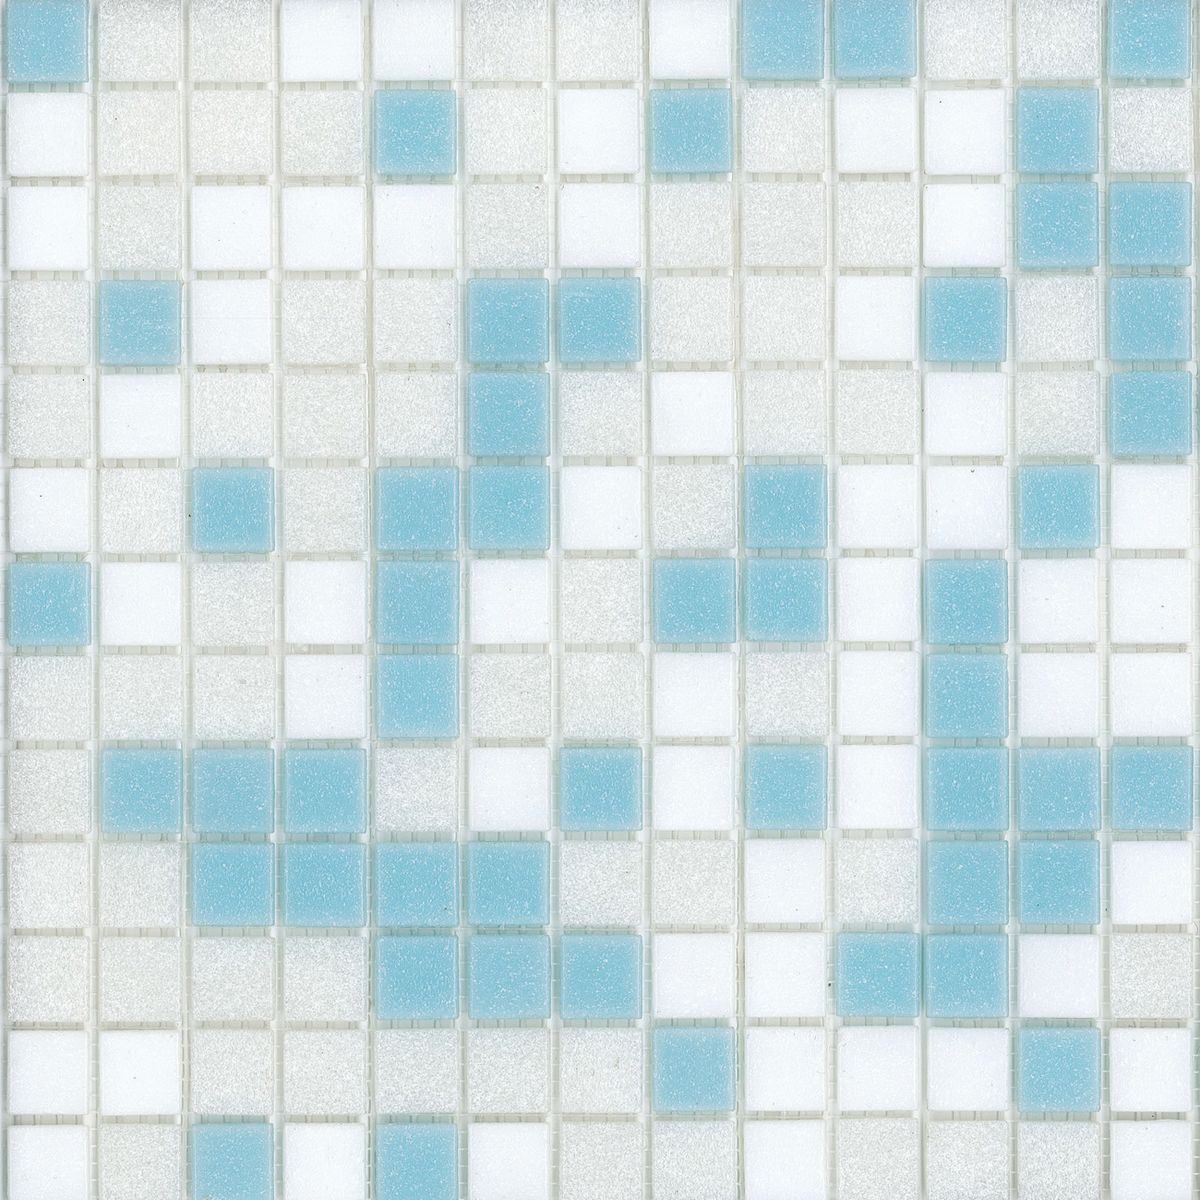 Piastrelle bagno mosaico azzurro yl85 regardsdefemmes for Mattonelle cucina mosaico